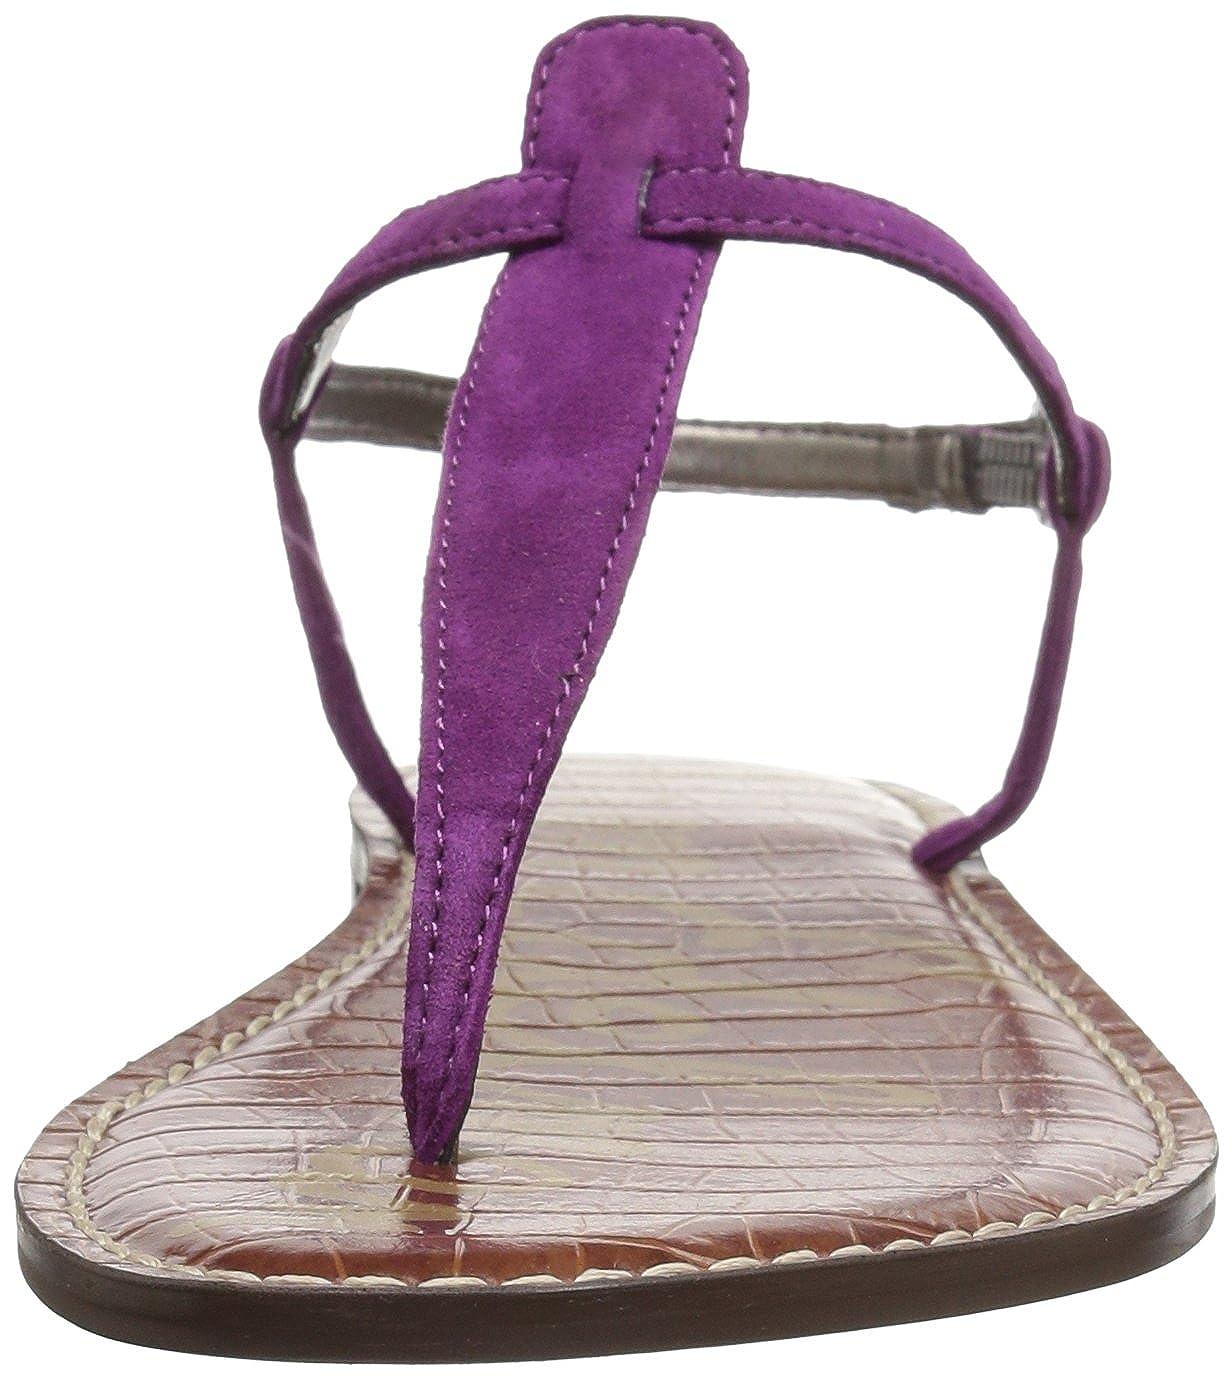 Sam Edelman Damen Gigi, Purple Plum, - 38 EU - Plum, a8f2c2